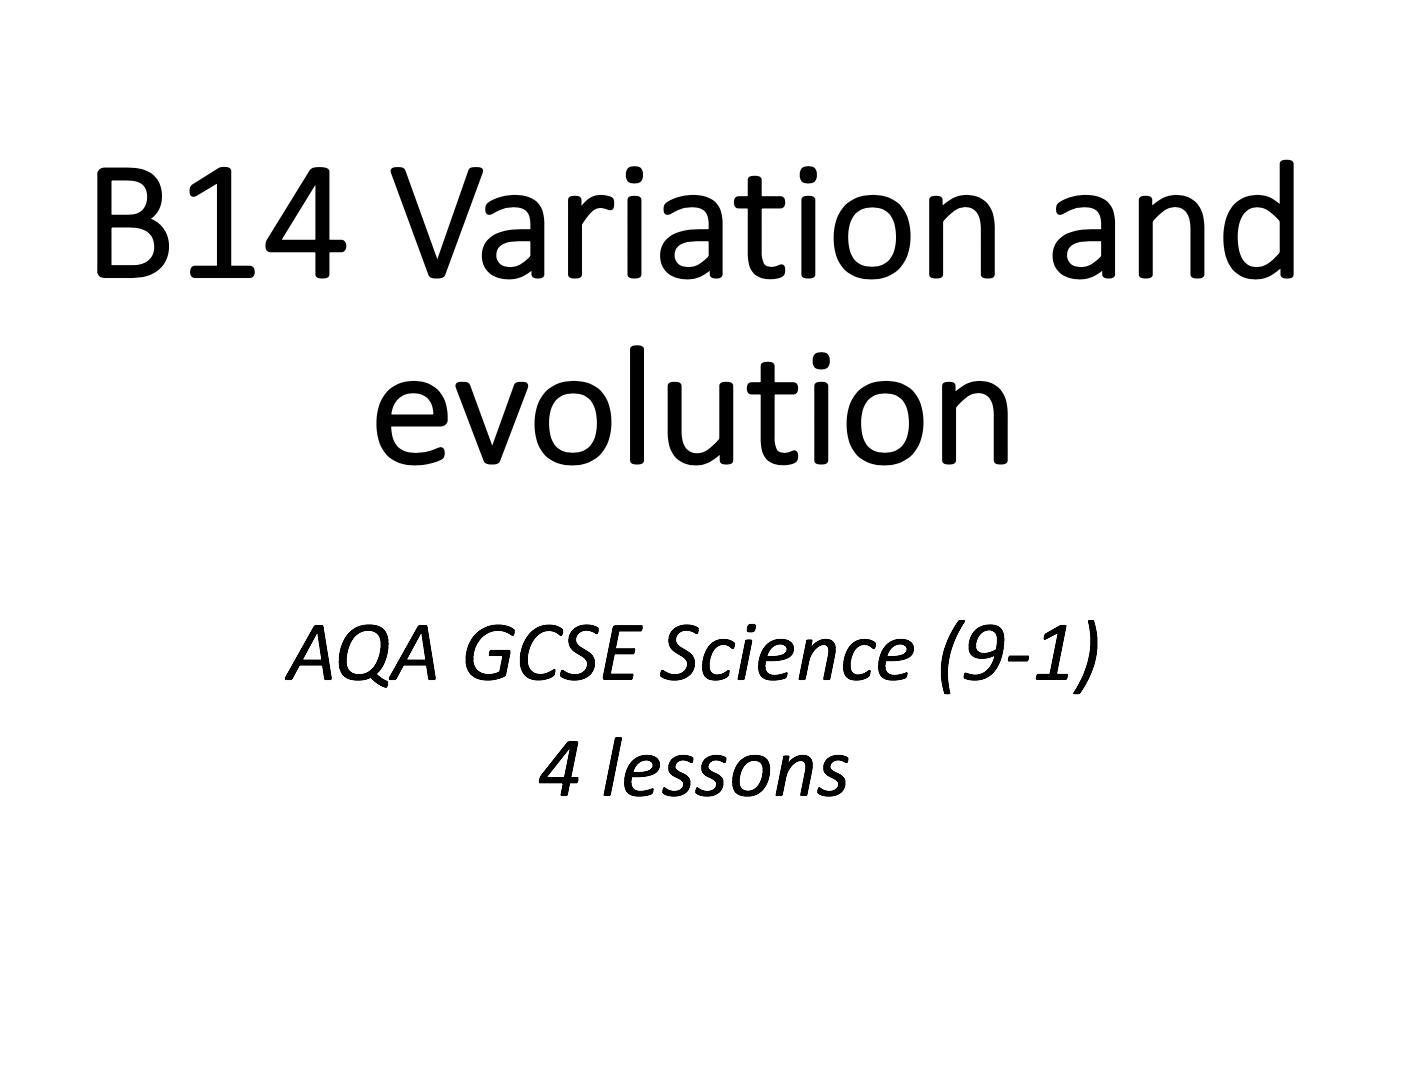 B14 Variation and evolution